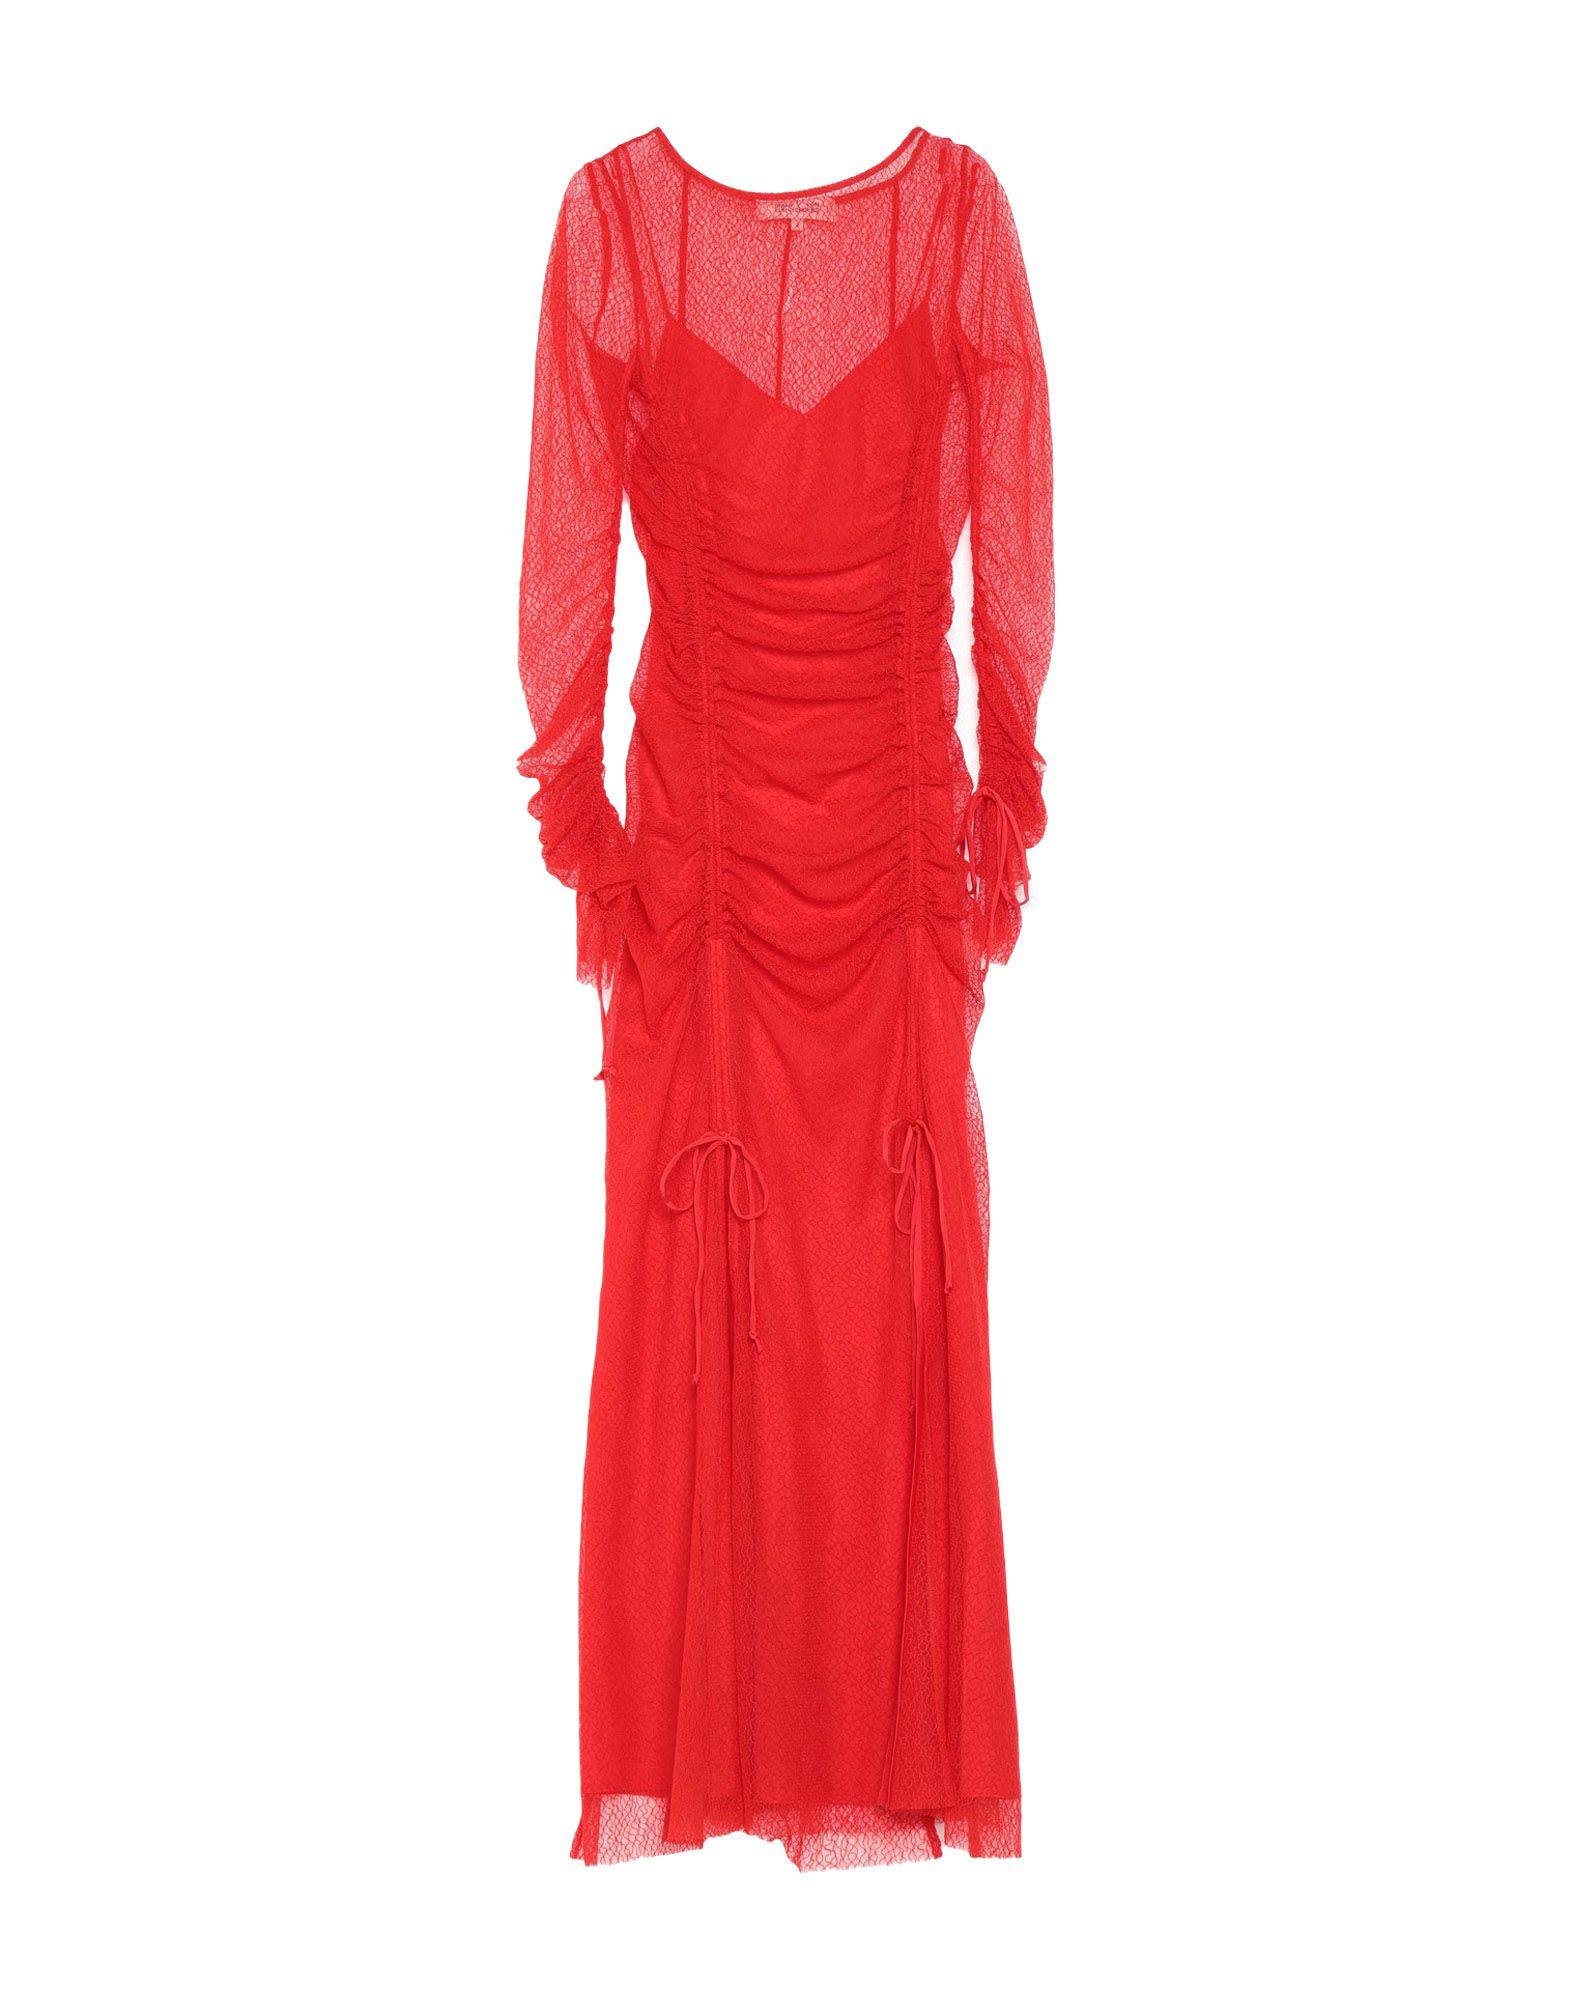 DIANE VON FURSTENBERG Длинное платье юбка diane von furstenberg юбки макси длинные